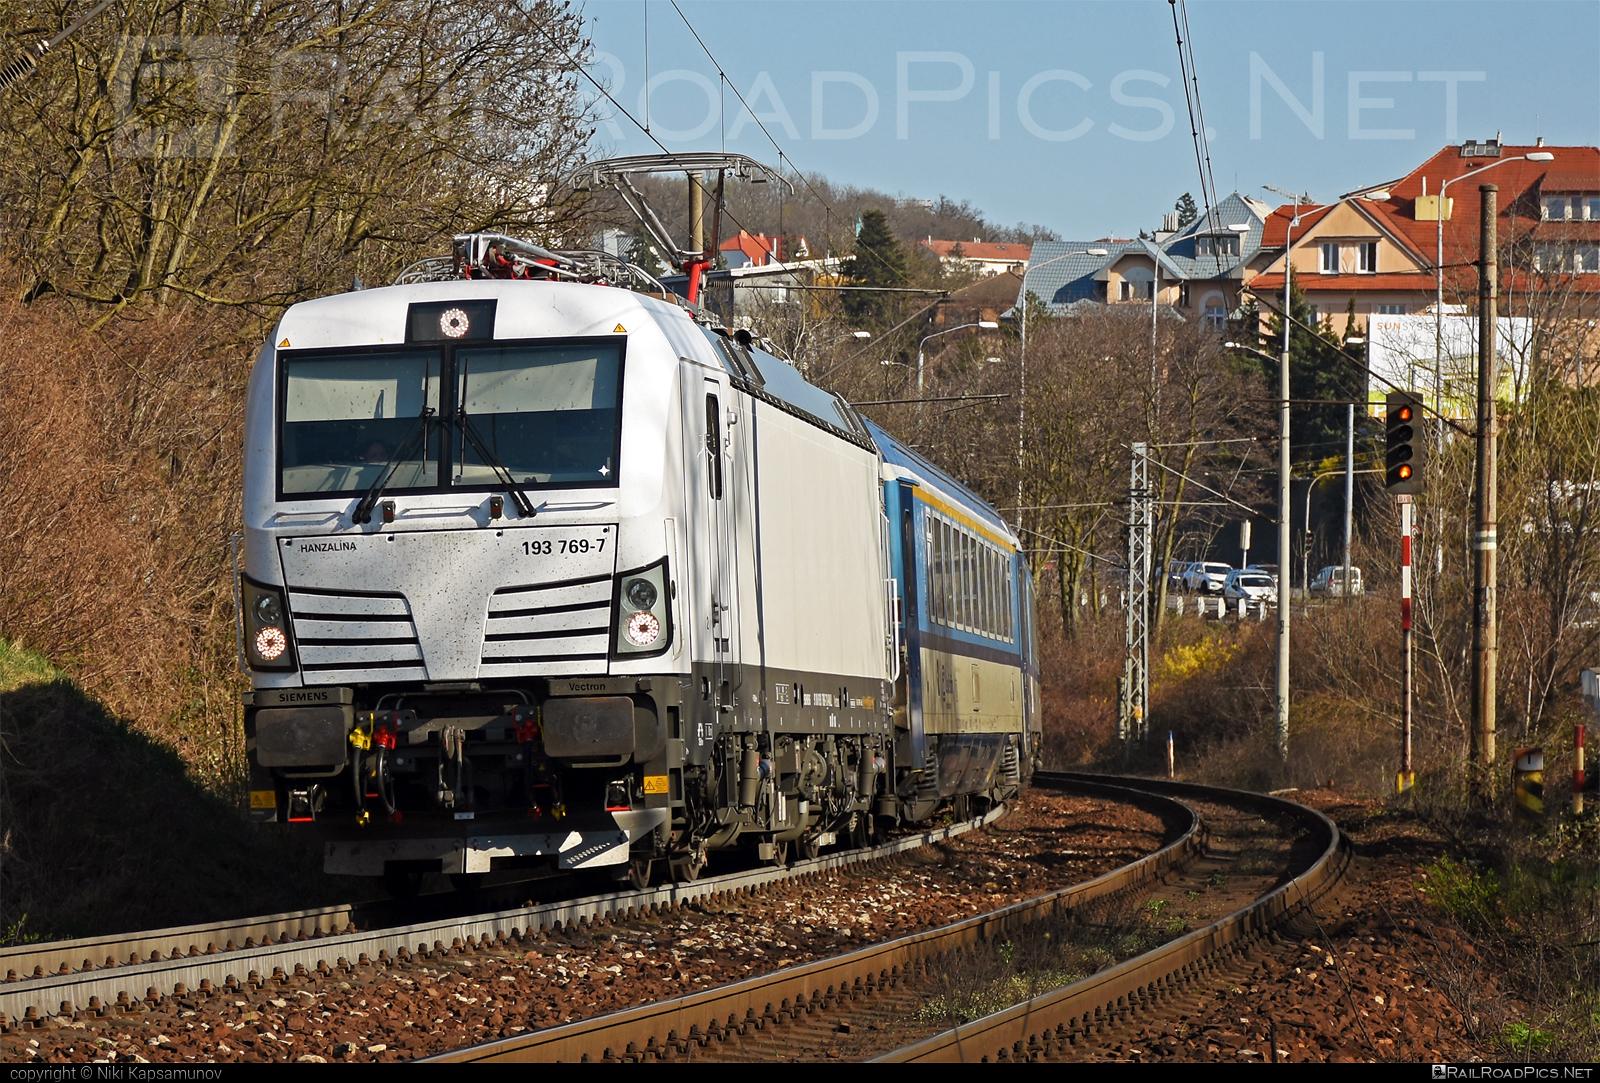 Siemens Vectron MS - 193 769-7 operated by České dráhy, a.s. #RollingStockLease #RollingStockLeaseSro #cd #ceskedrahy #raill #siemens #siemensvectron #siemensvectronms #vectron #vectronms